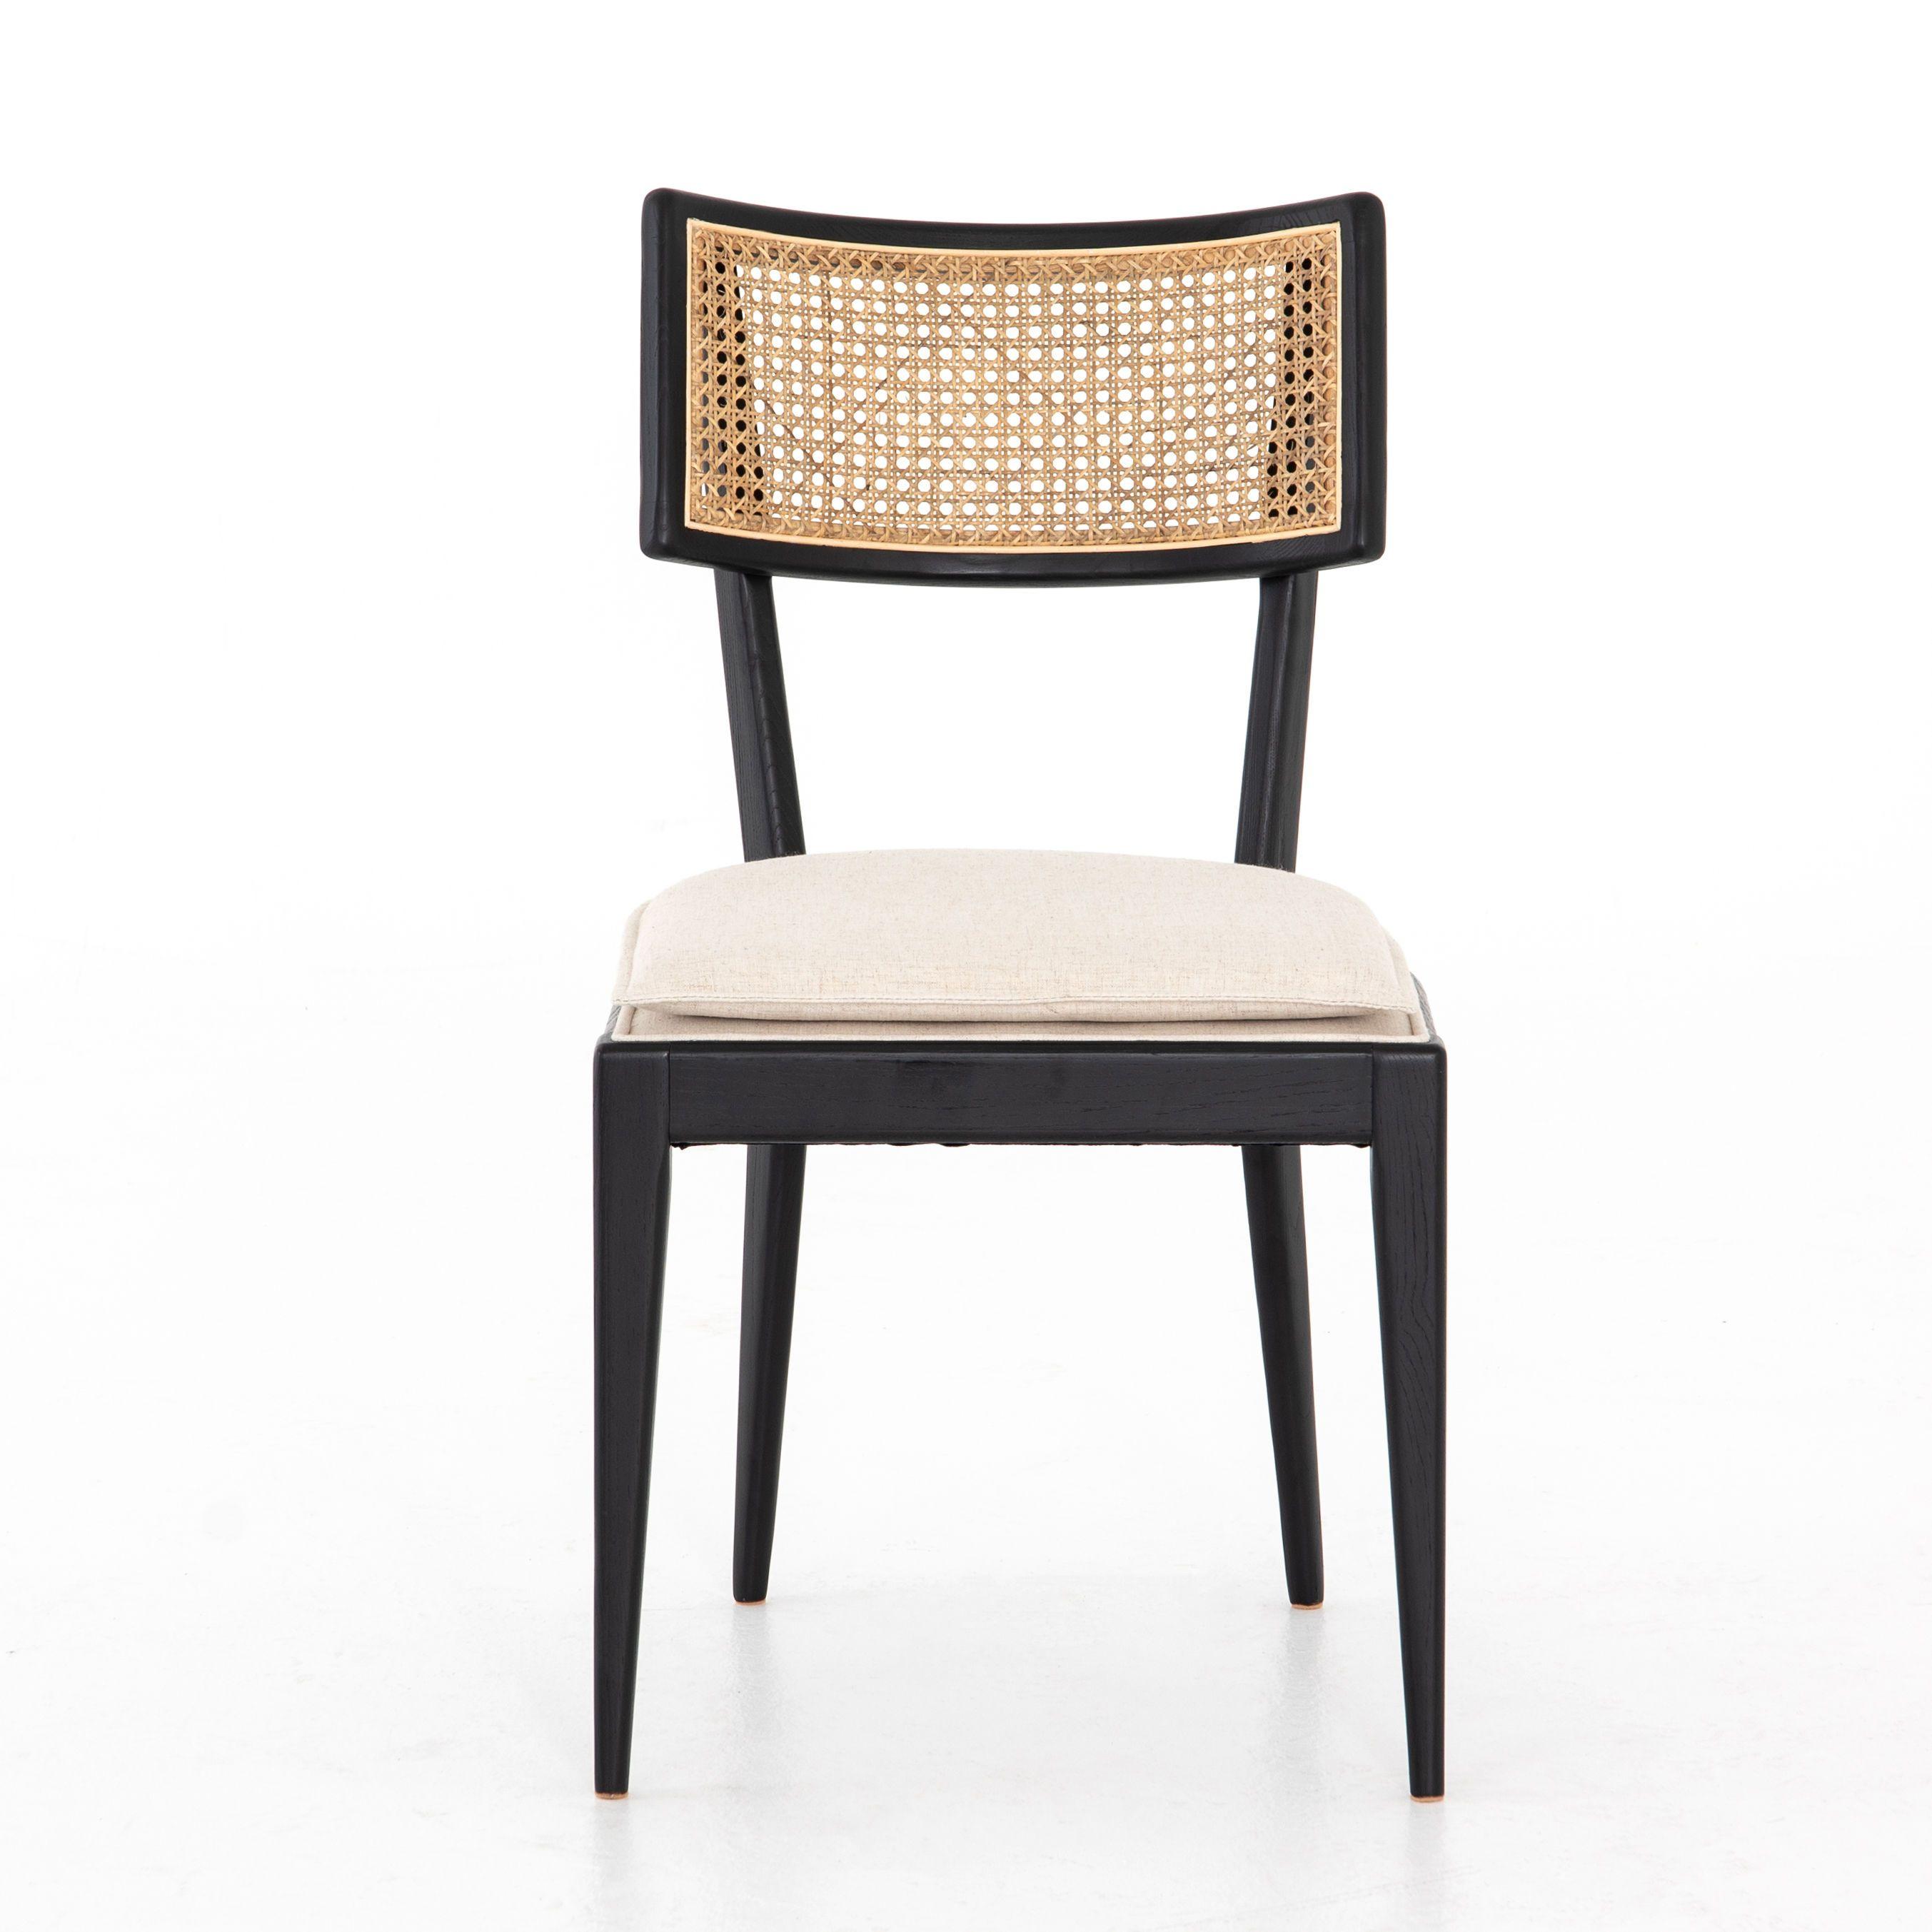 Jaz Dining Chair Savile Flax Cane Dining Chairs Midcentury Modern Dining Chairs Dining Chairs